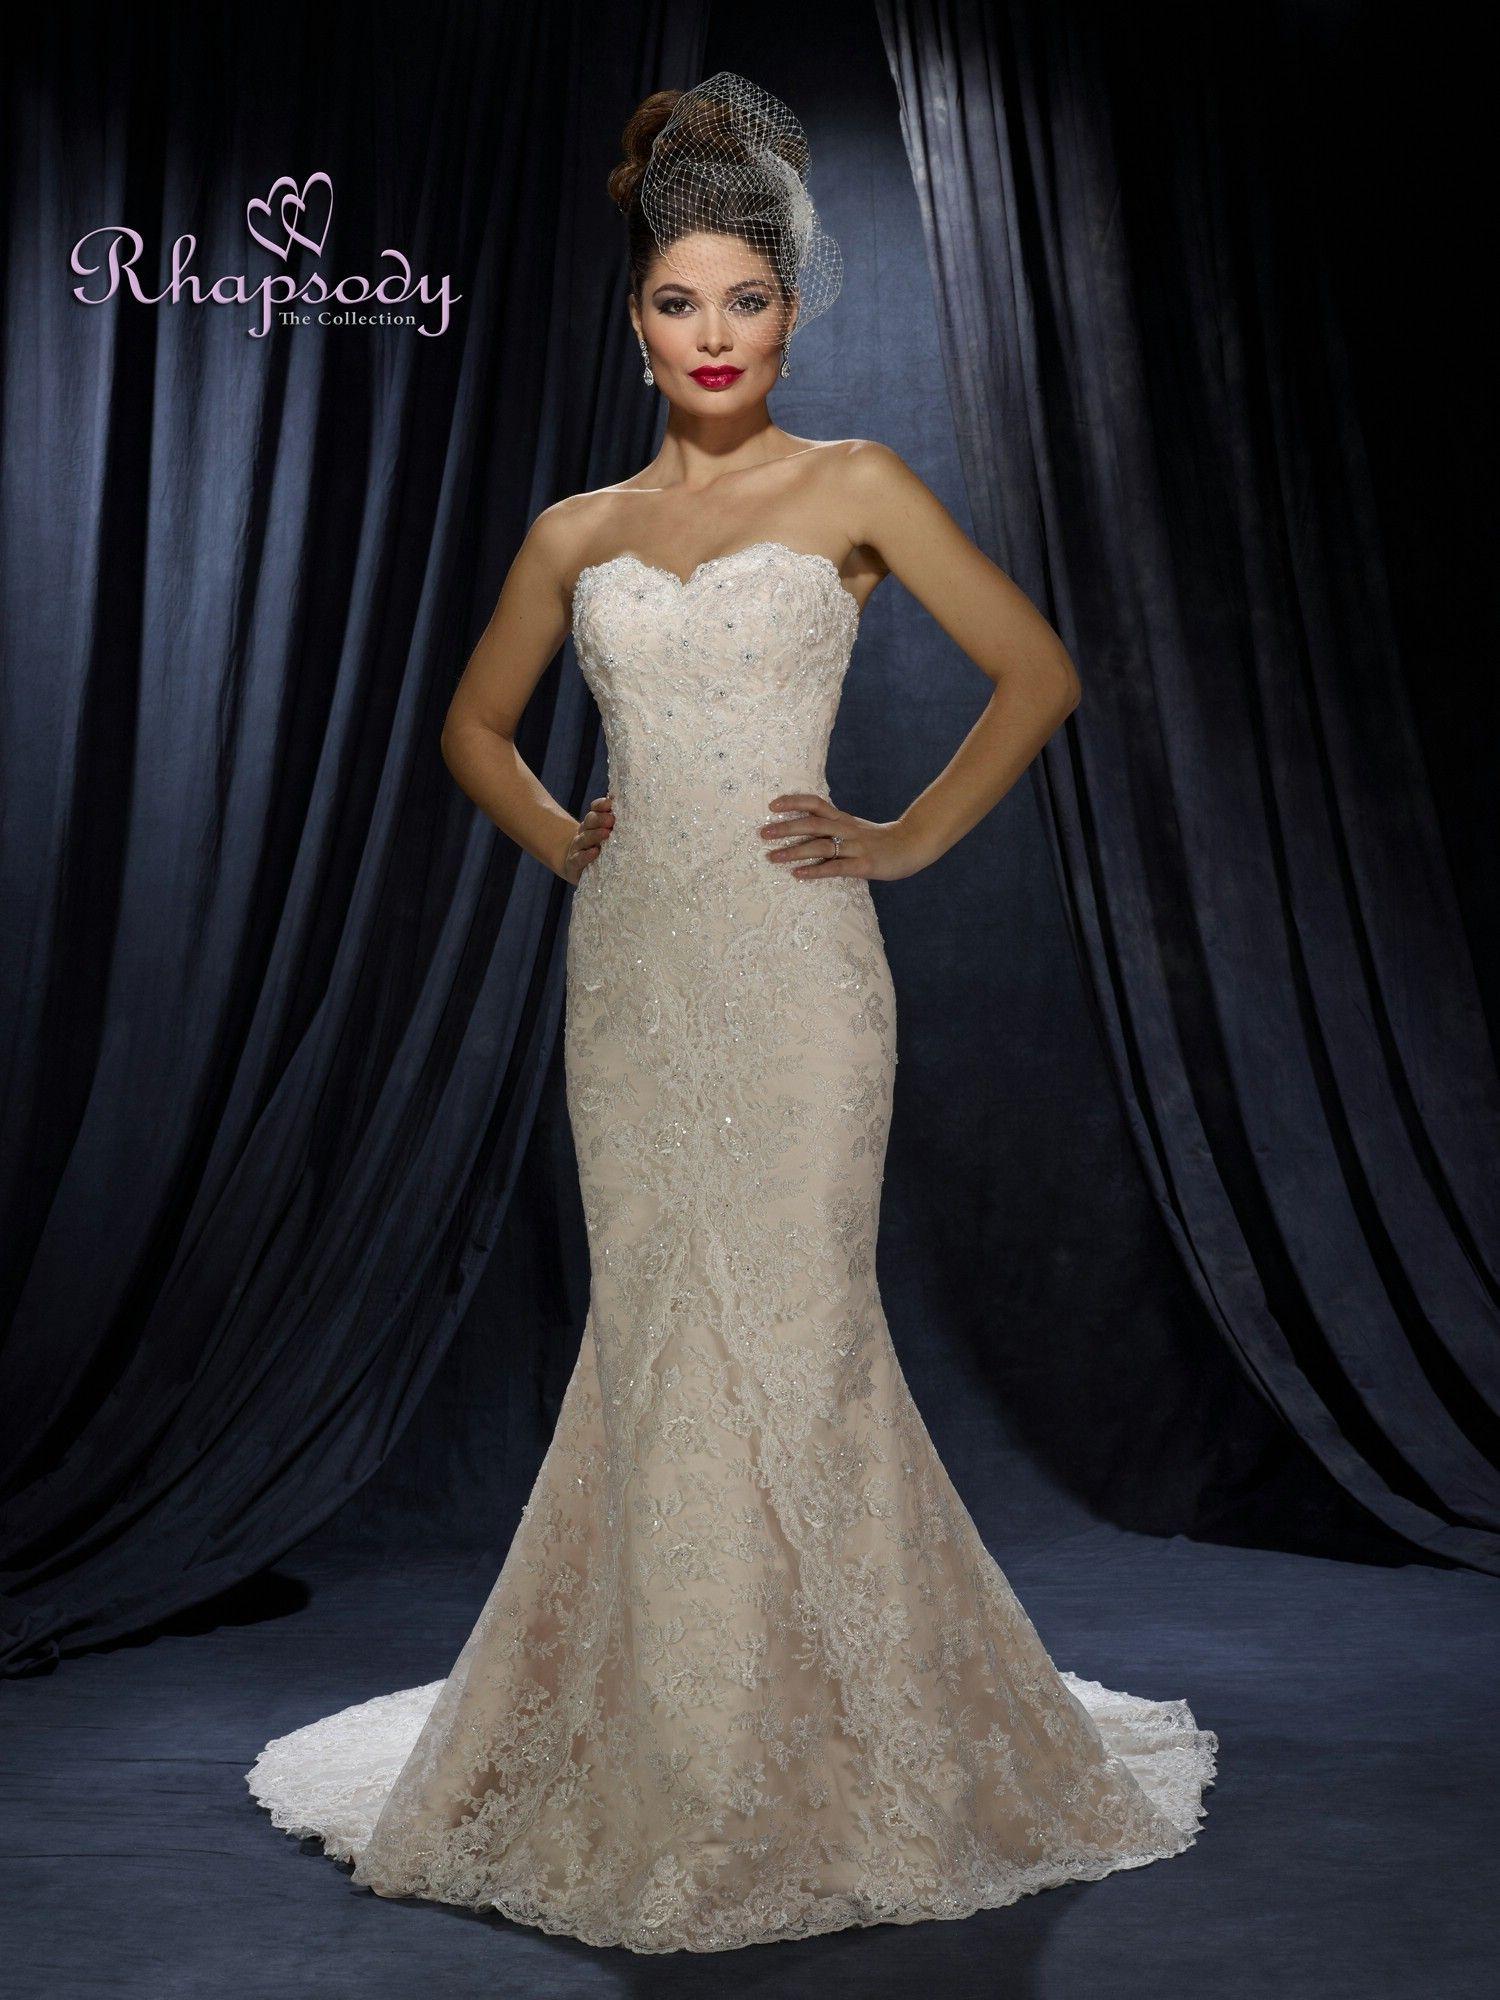 Symphony Rhapsody Wedding Dresses Style R7205 1 375 00